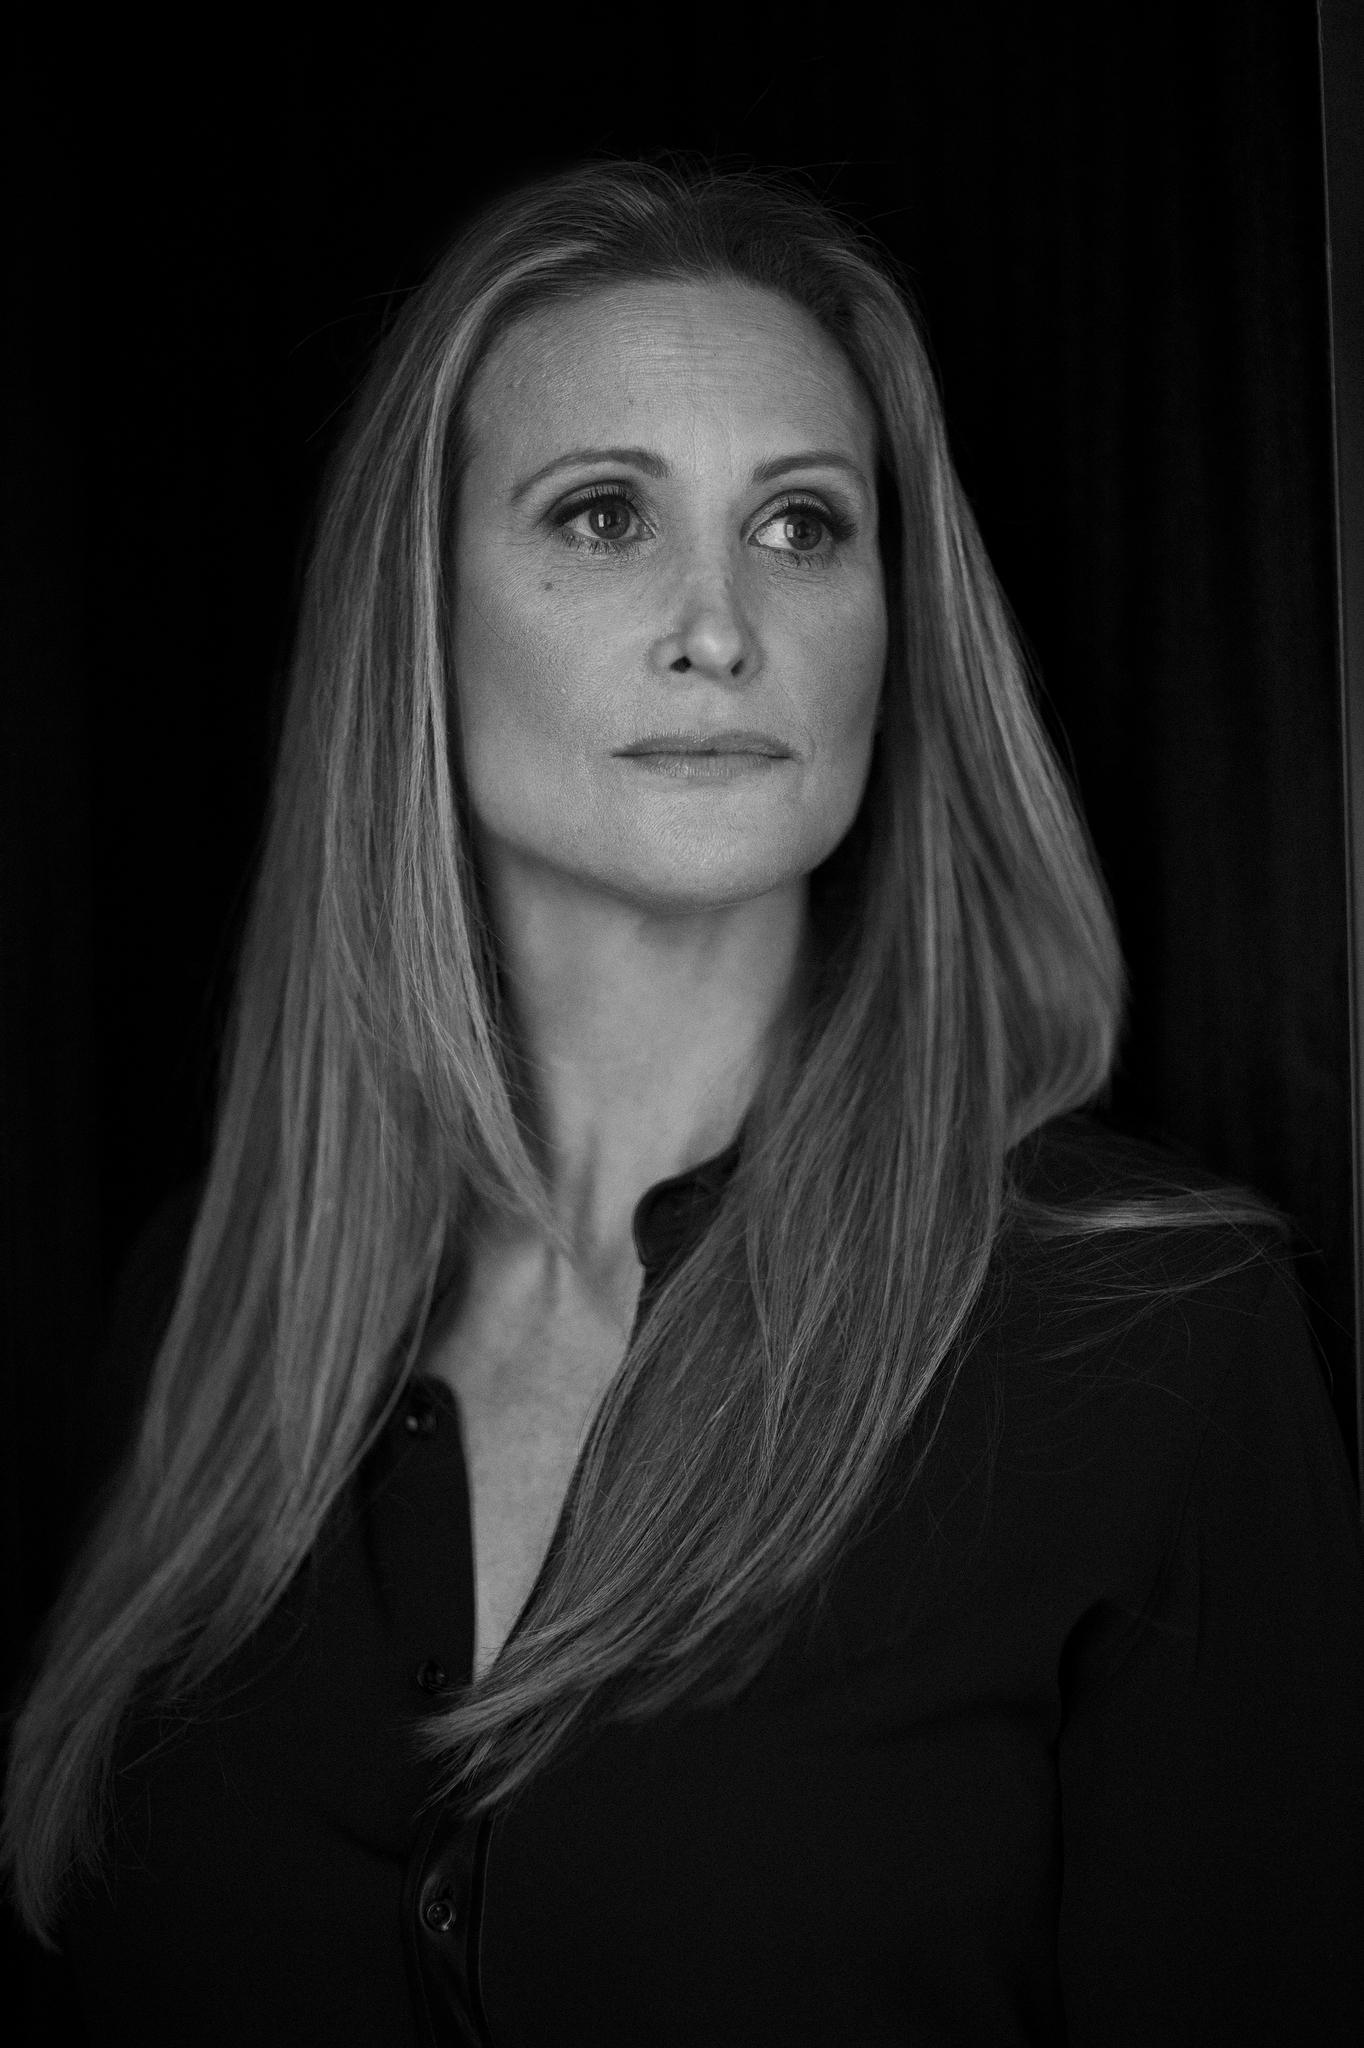 Stephanie Winston Wolkoff